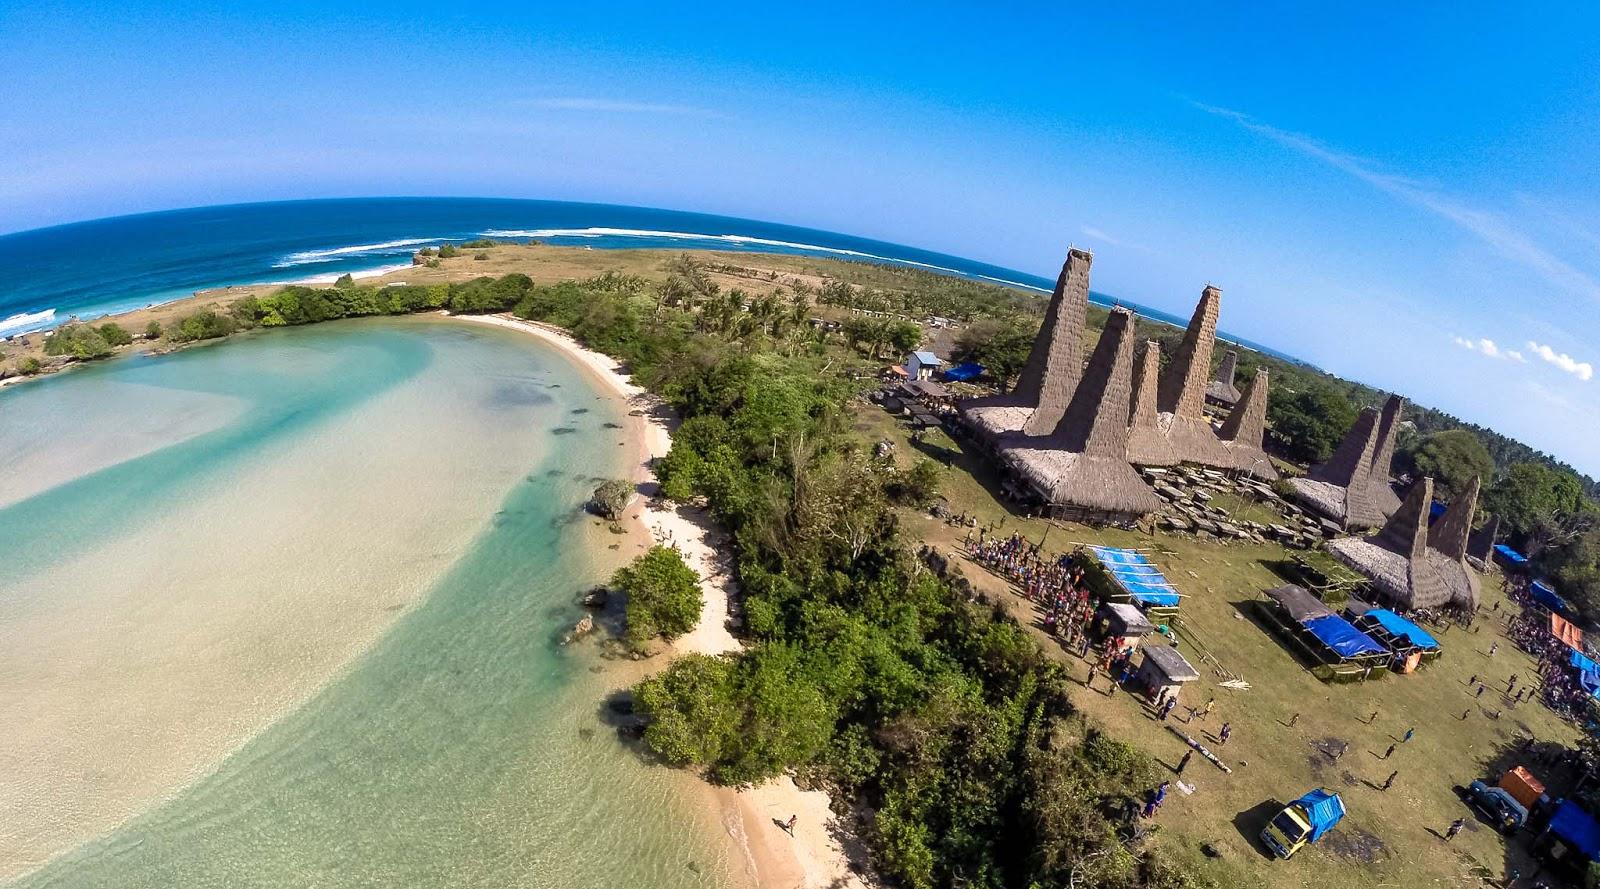 2. Pantai Ratenggaro